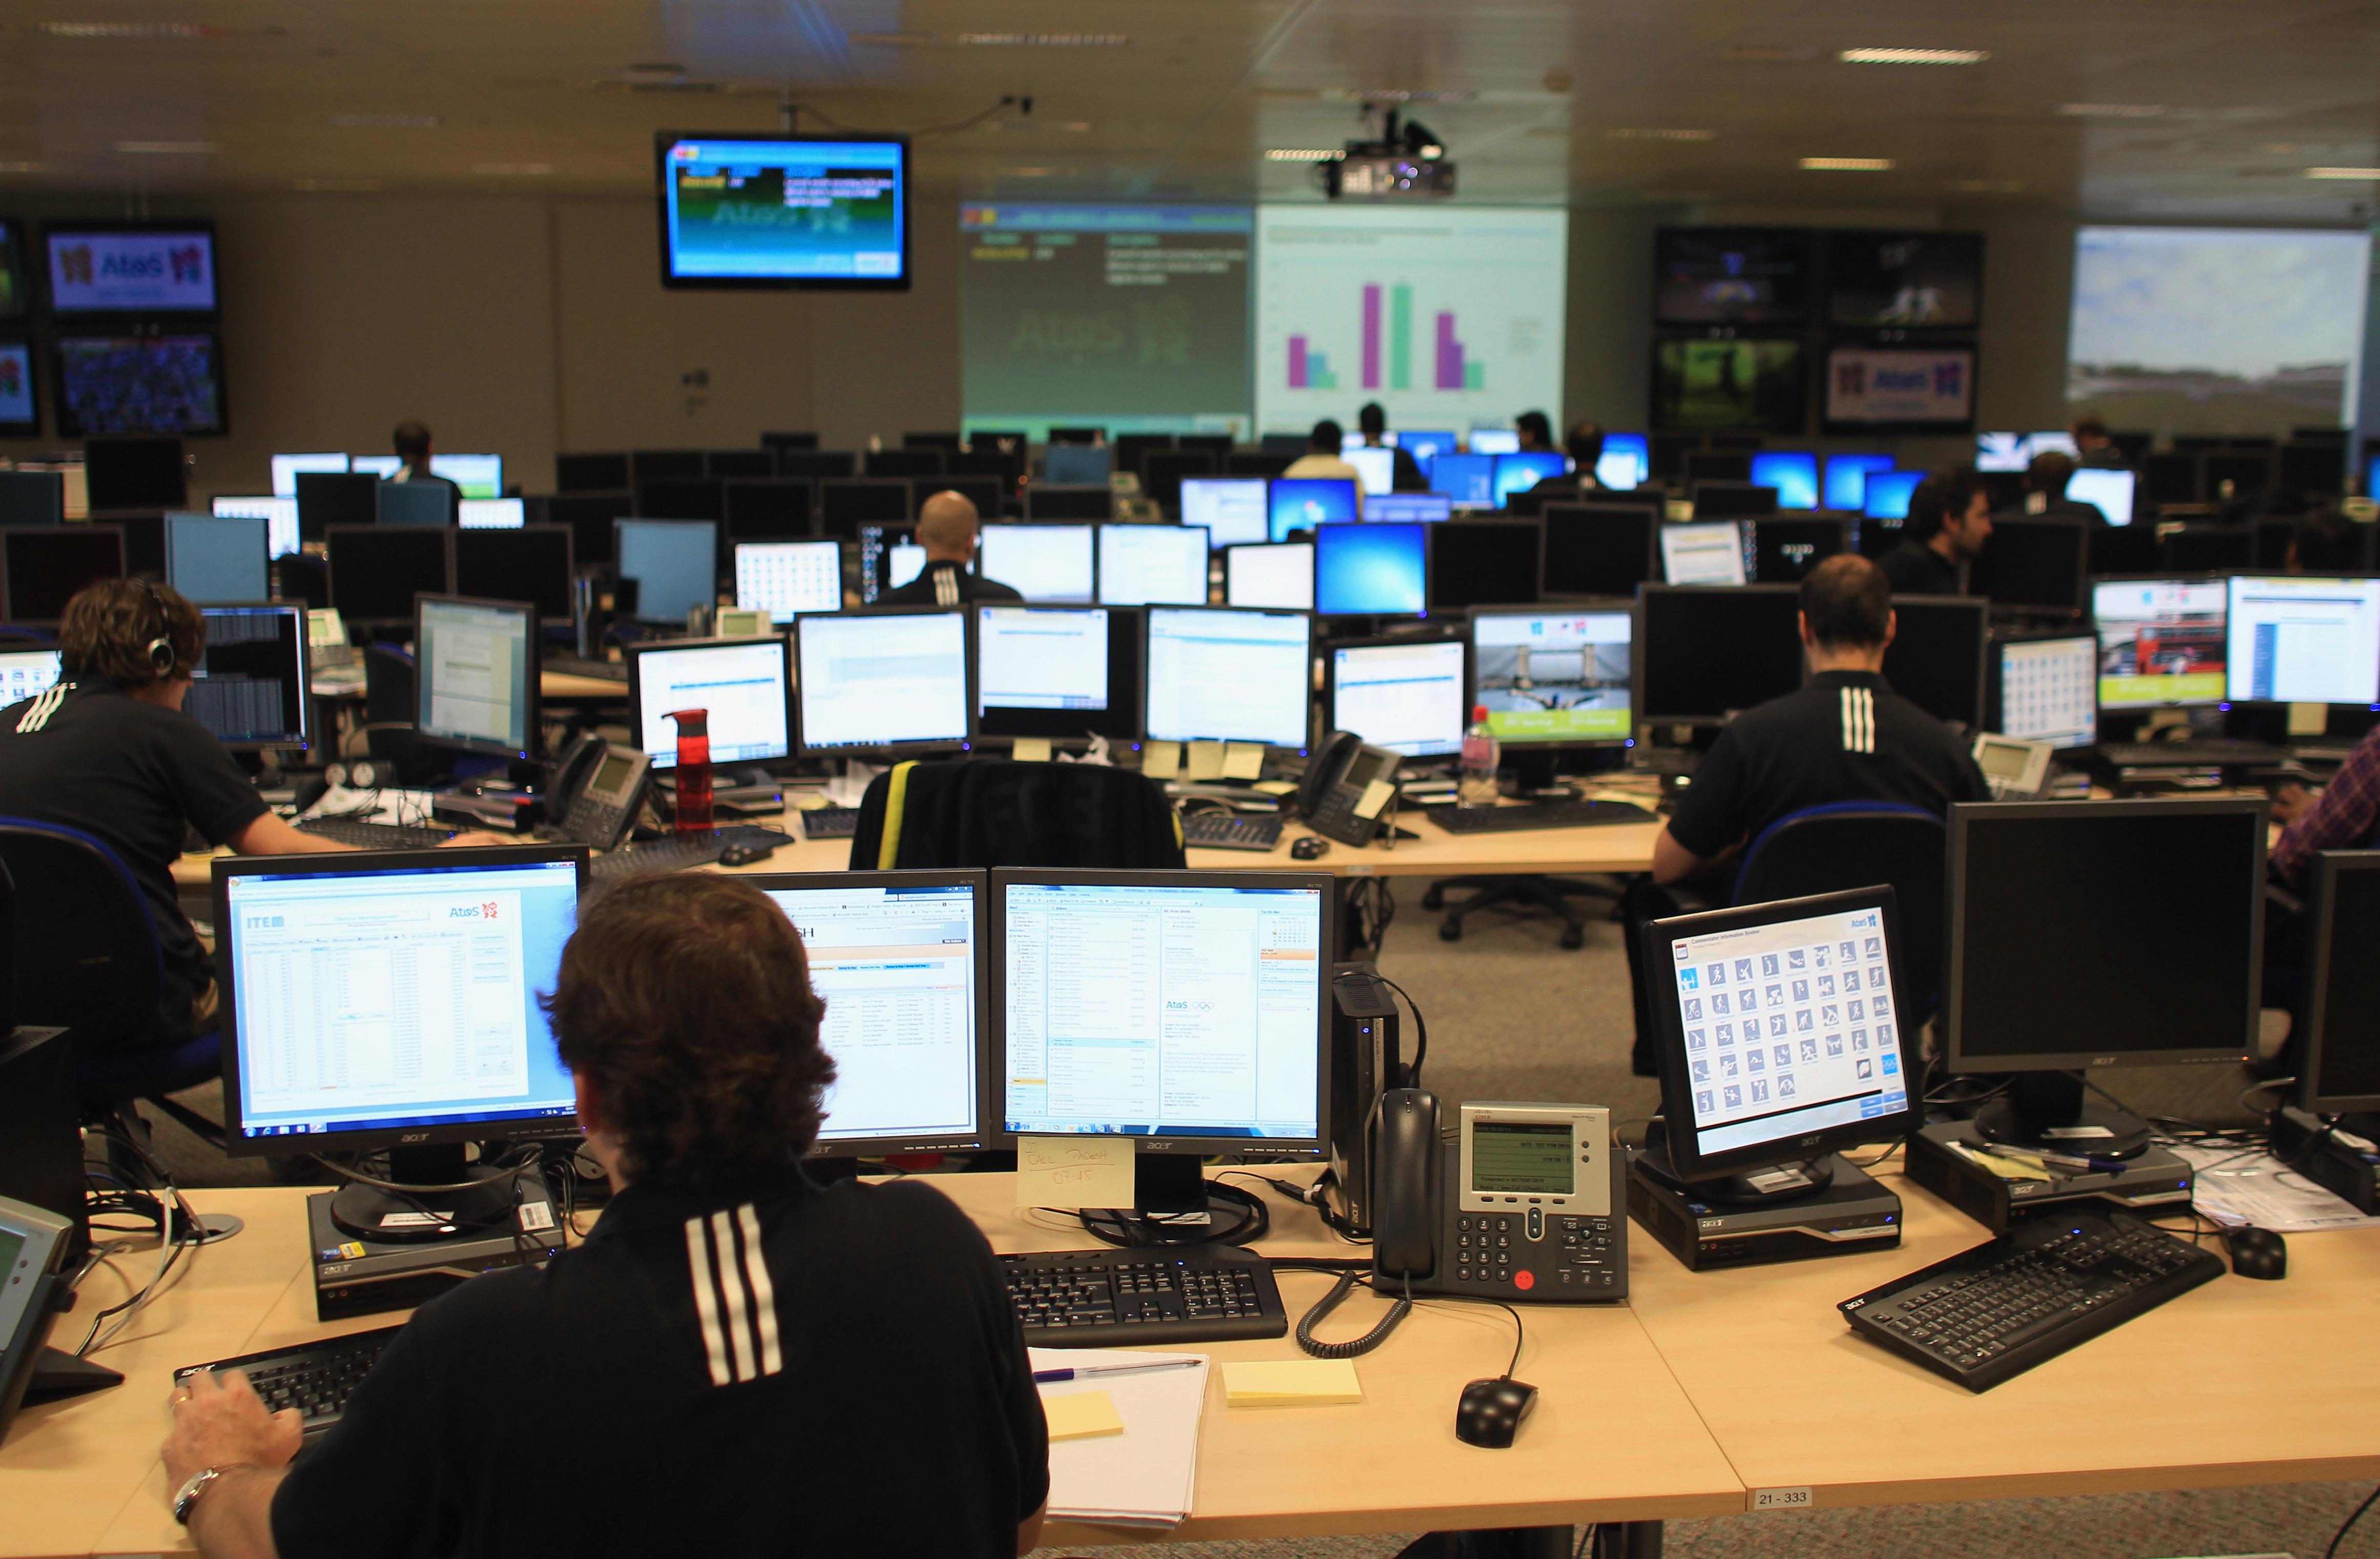 Atos unveils London 2012 Technology Operations Centre